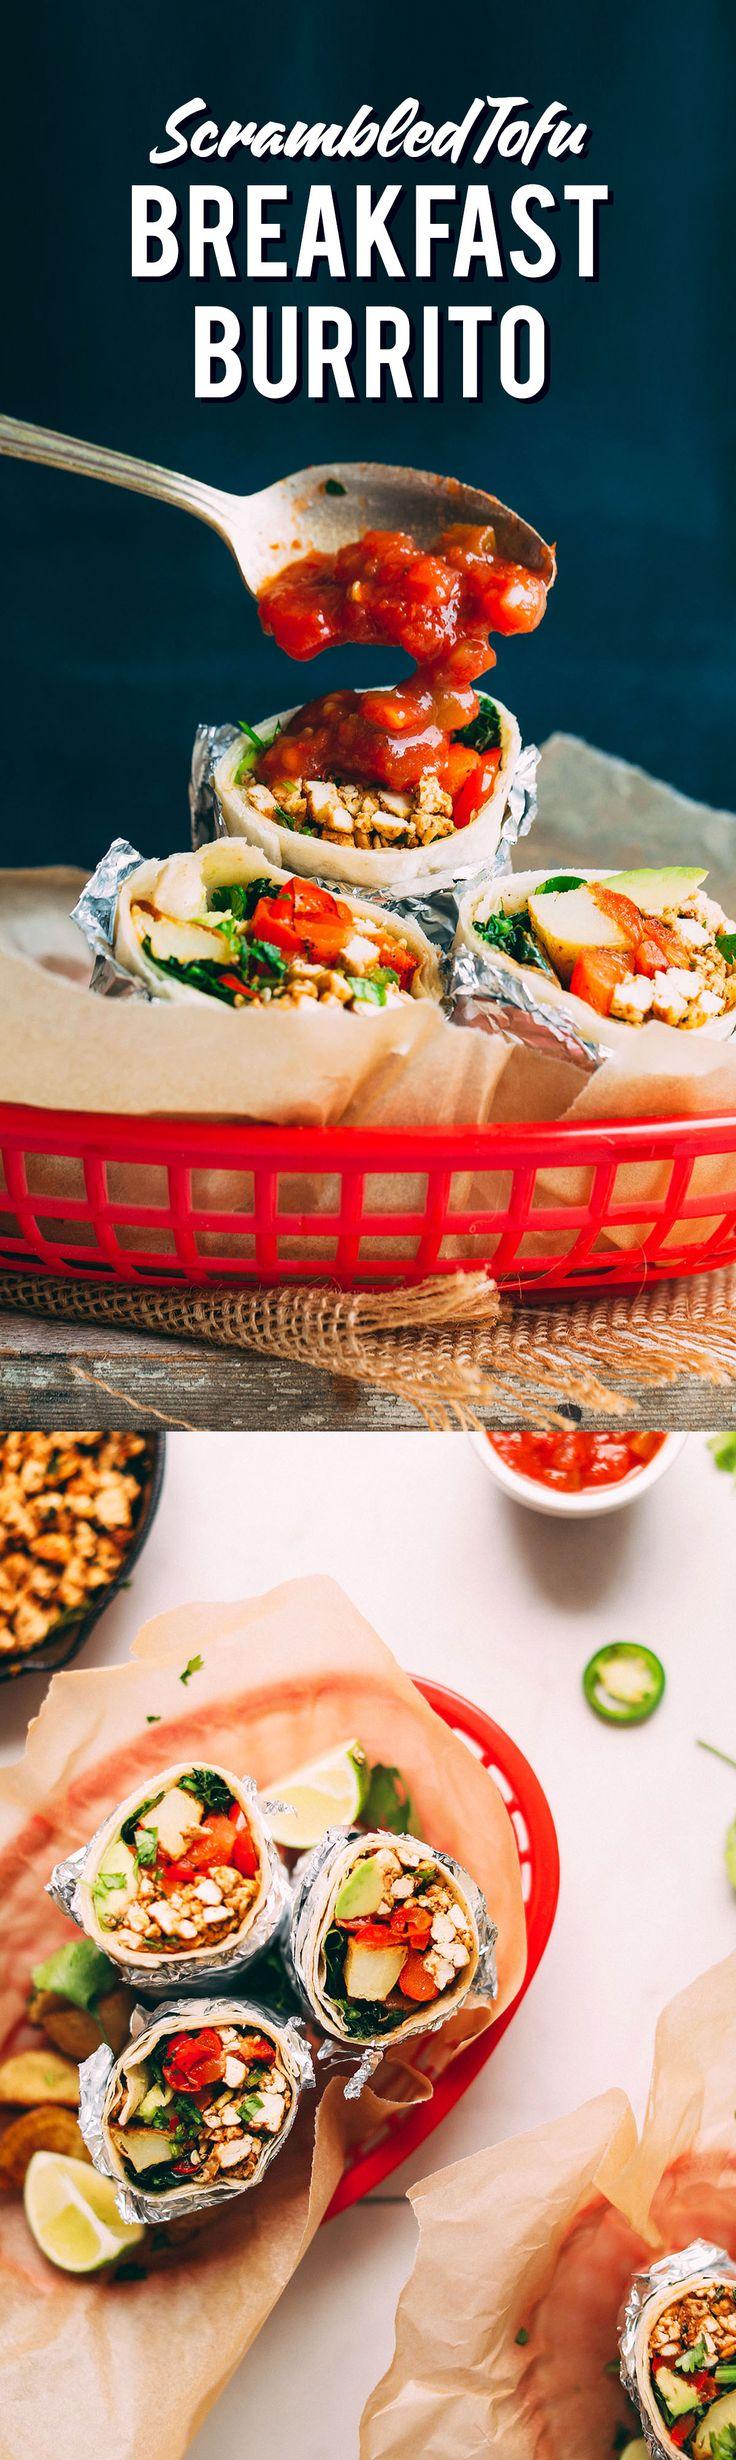 30-minute vegan breakfast burrito with scrambled tofu, roasted vegetables, avocado, kale, and salsa